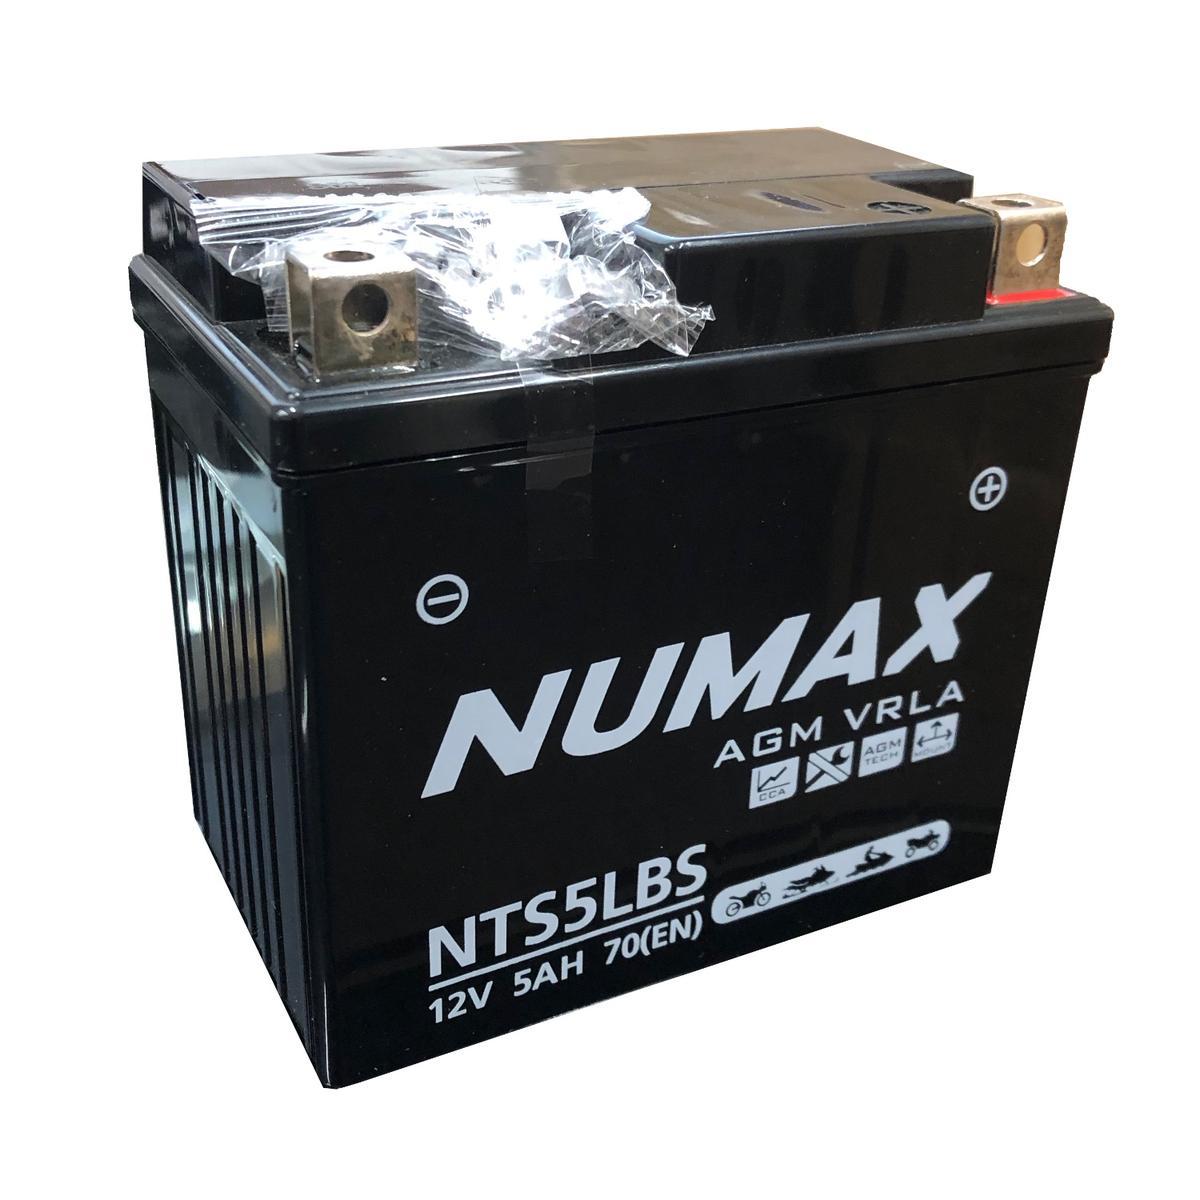 Numax NTS5LBS KTM 450 MXC Racing Motorcycle Battery NEW